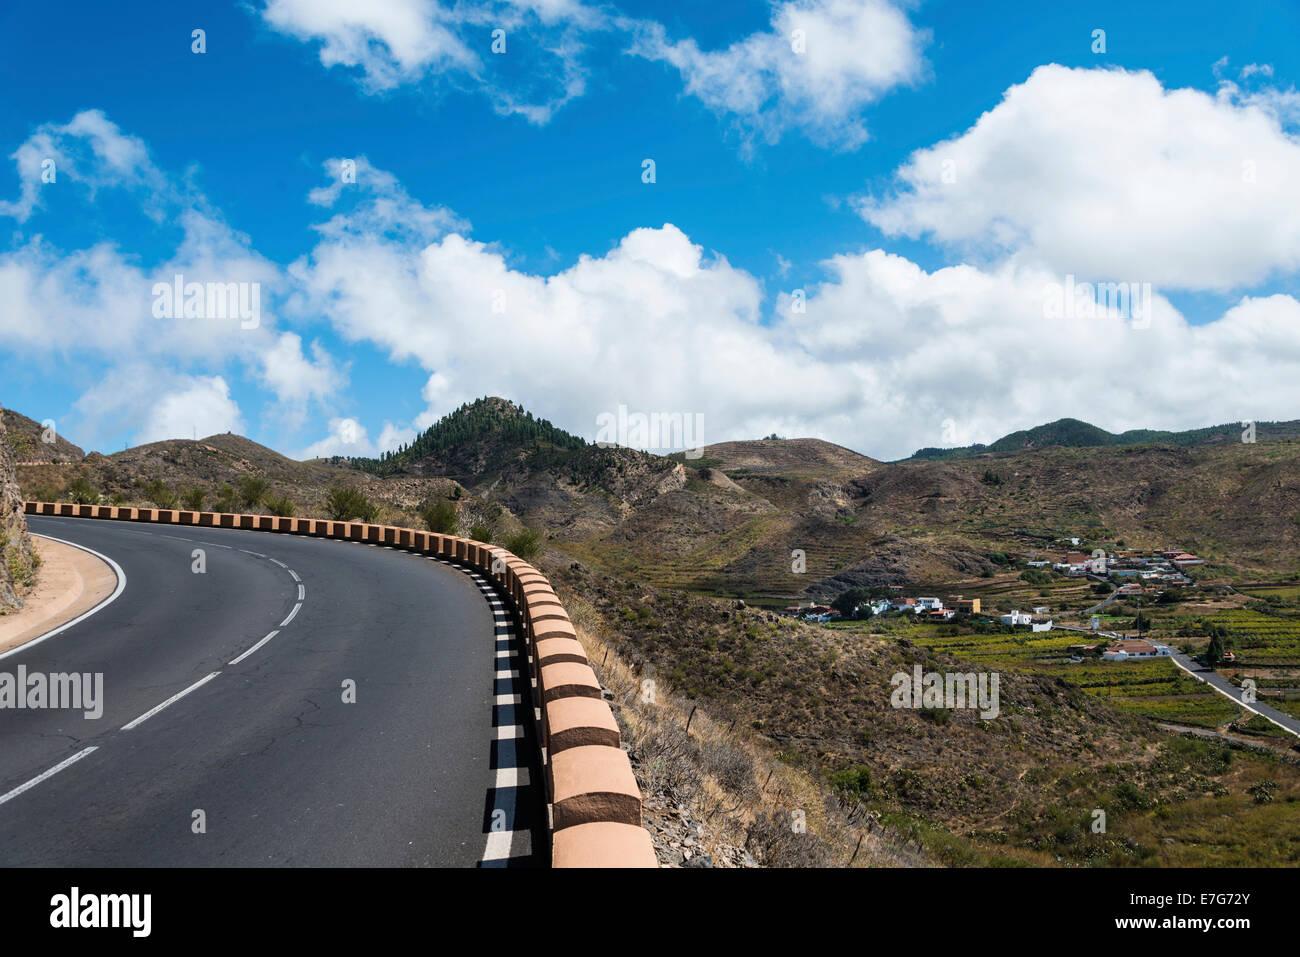 Road, Santiago del Teide, Tenerife, Canary Islands, Spain - Stock Image